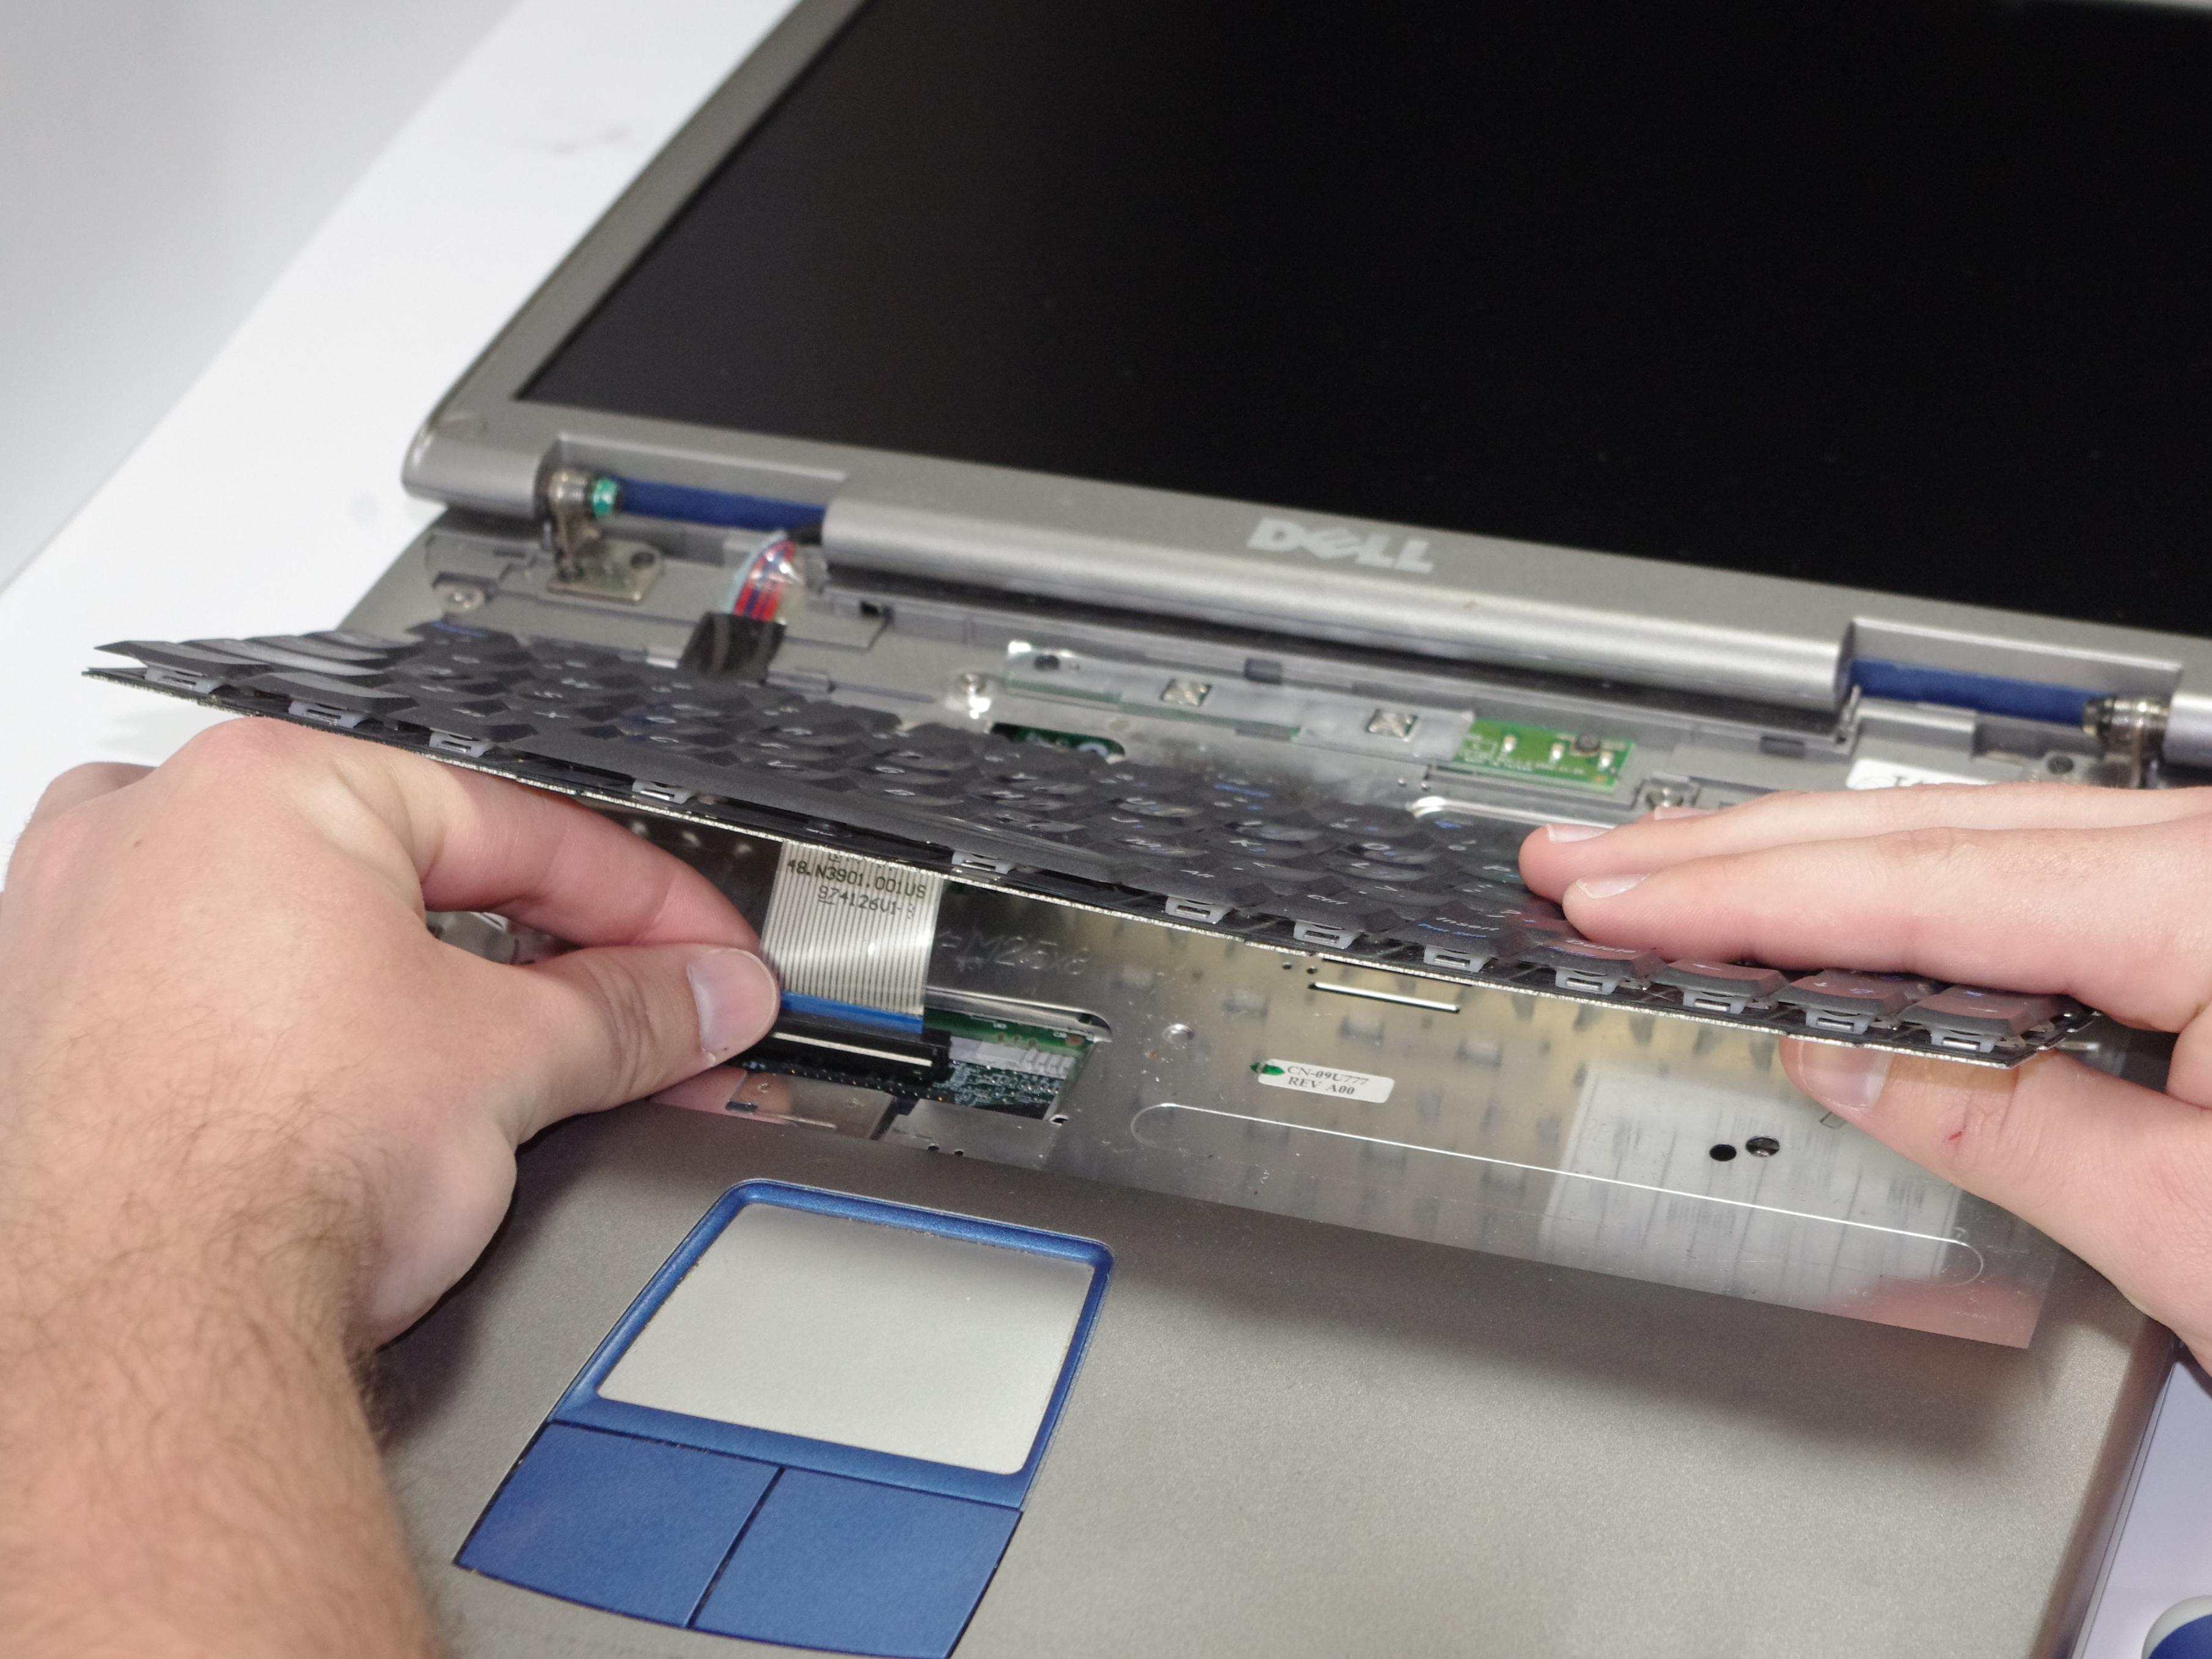 dell inspiron 5100 pp07l repair ifixit rh ifixit com MPF Tray Dell Dell 5100Cn Printer Driver